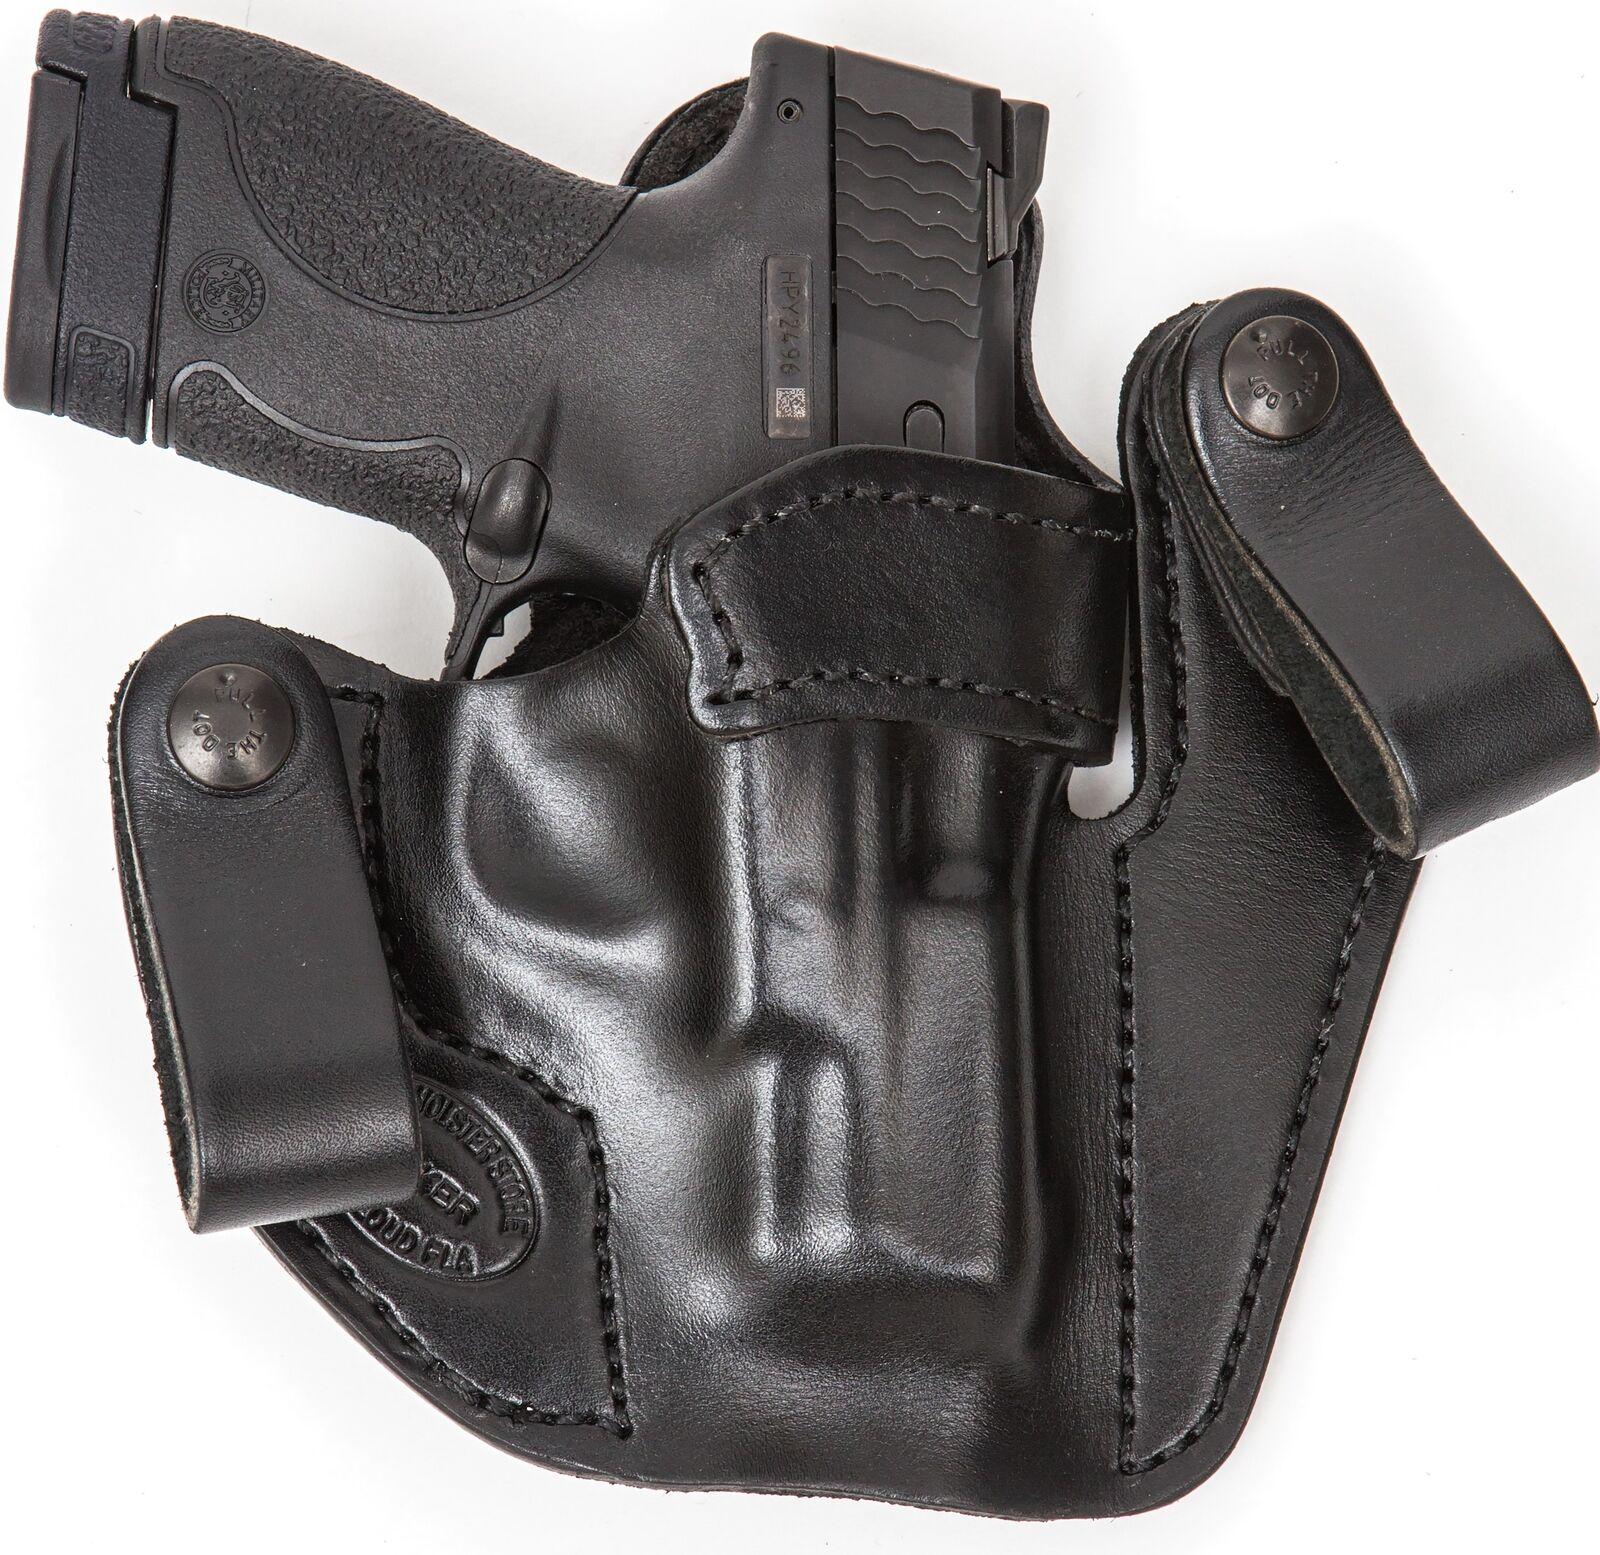 Xtreme llevar RH LH IWB Cuero Funda Pistola para Springfield XDM 5.25